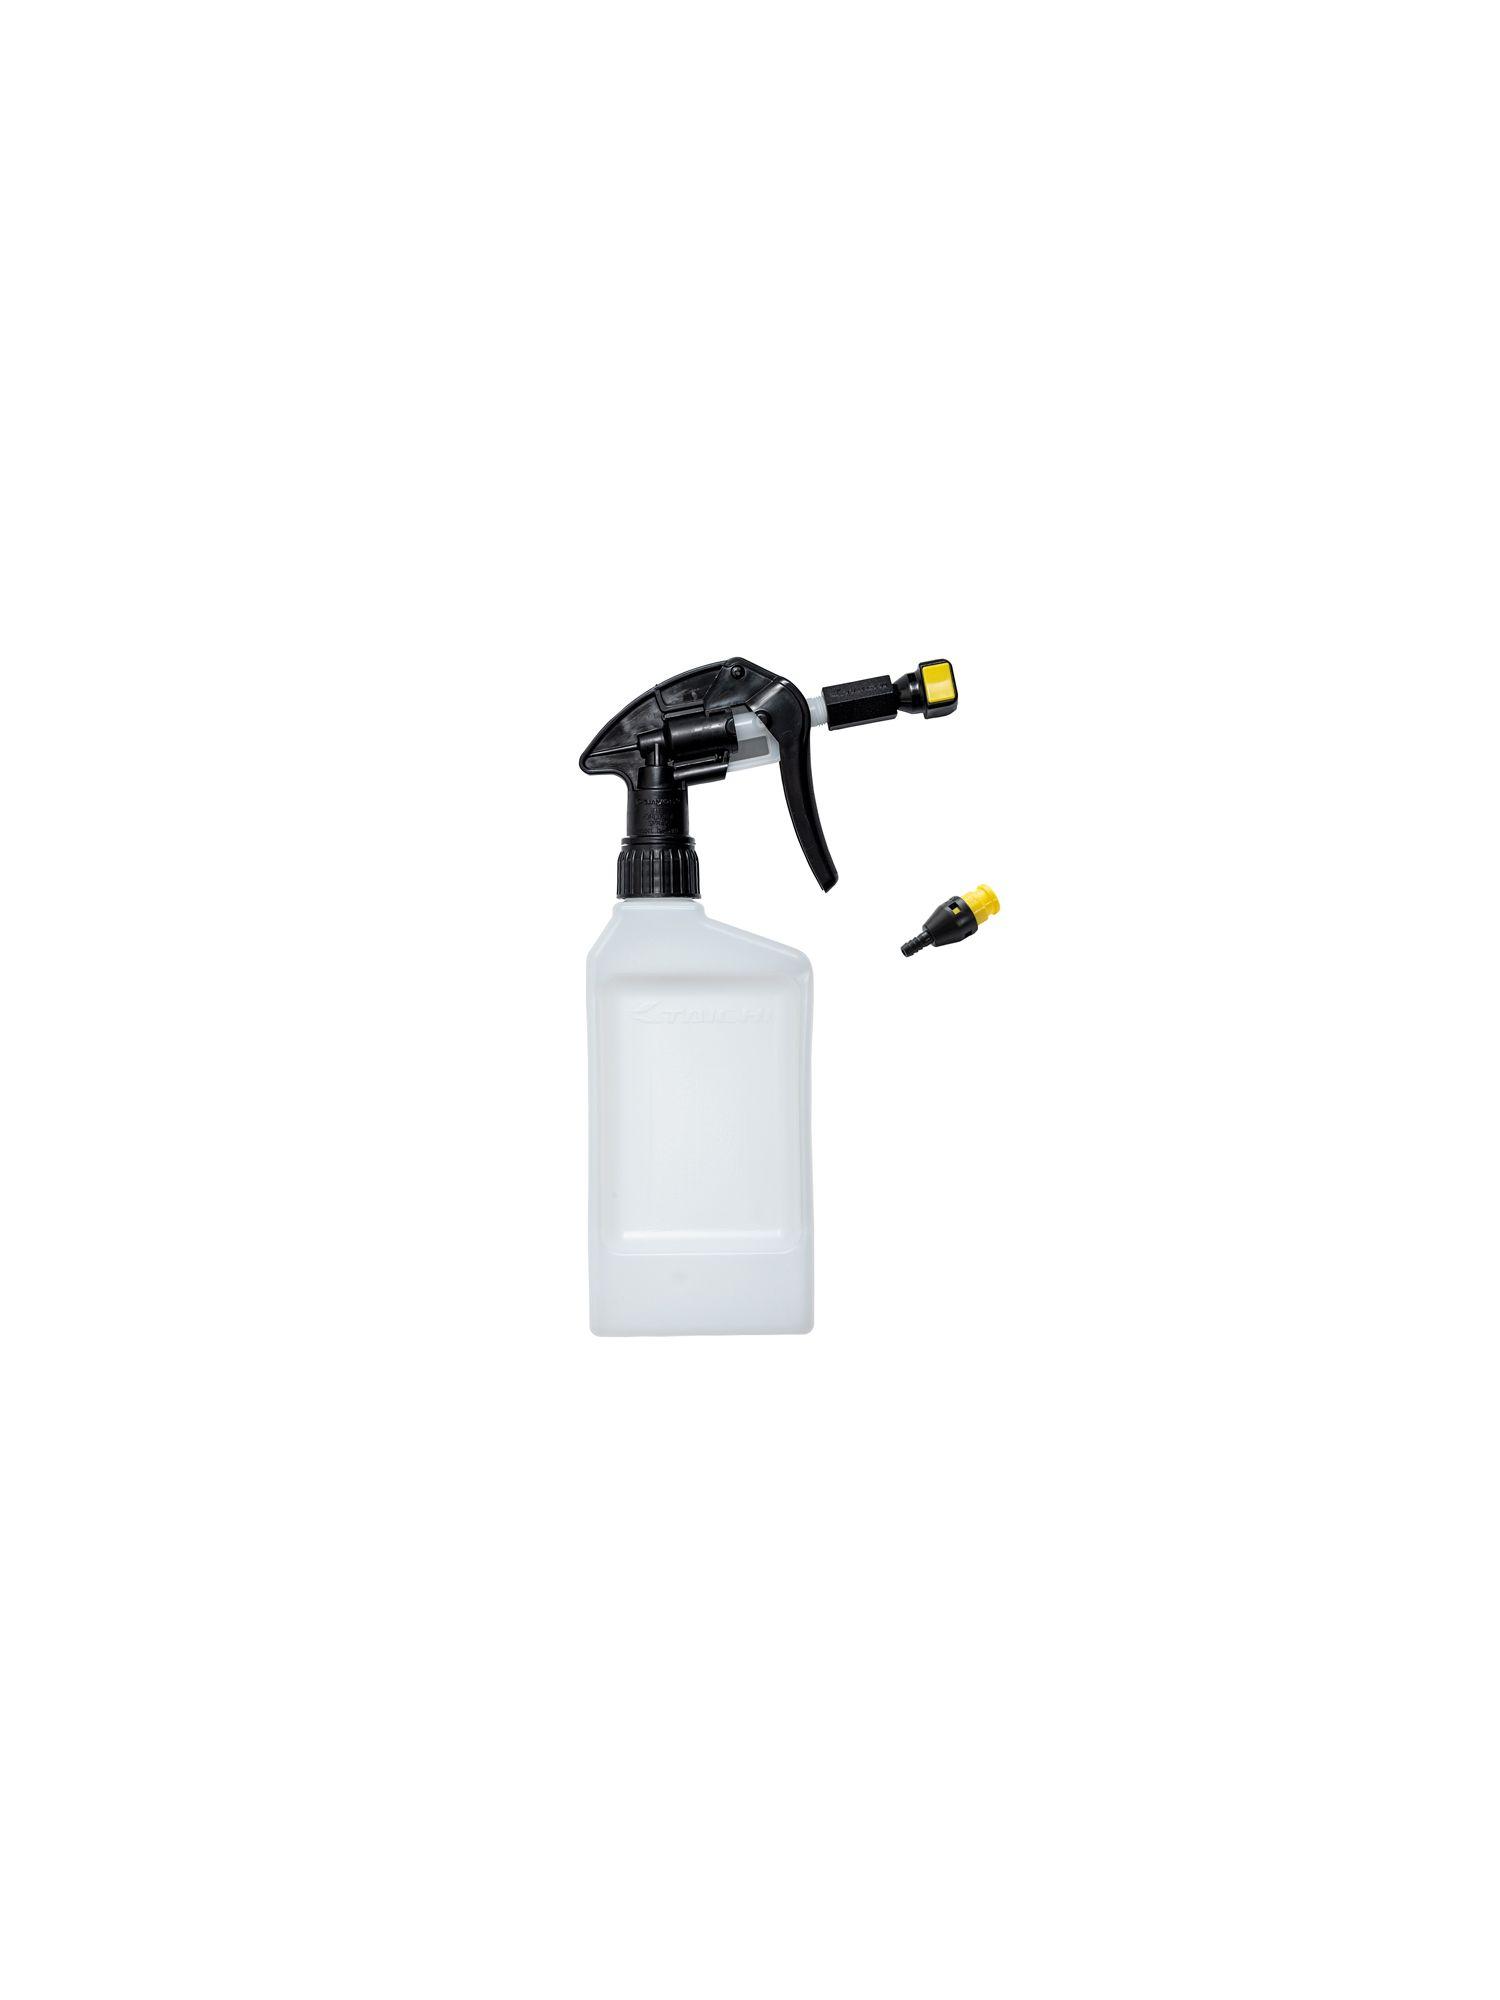 RSP503 | リキッドウインド スプレー&ボトルキット